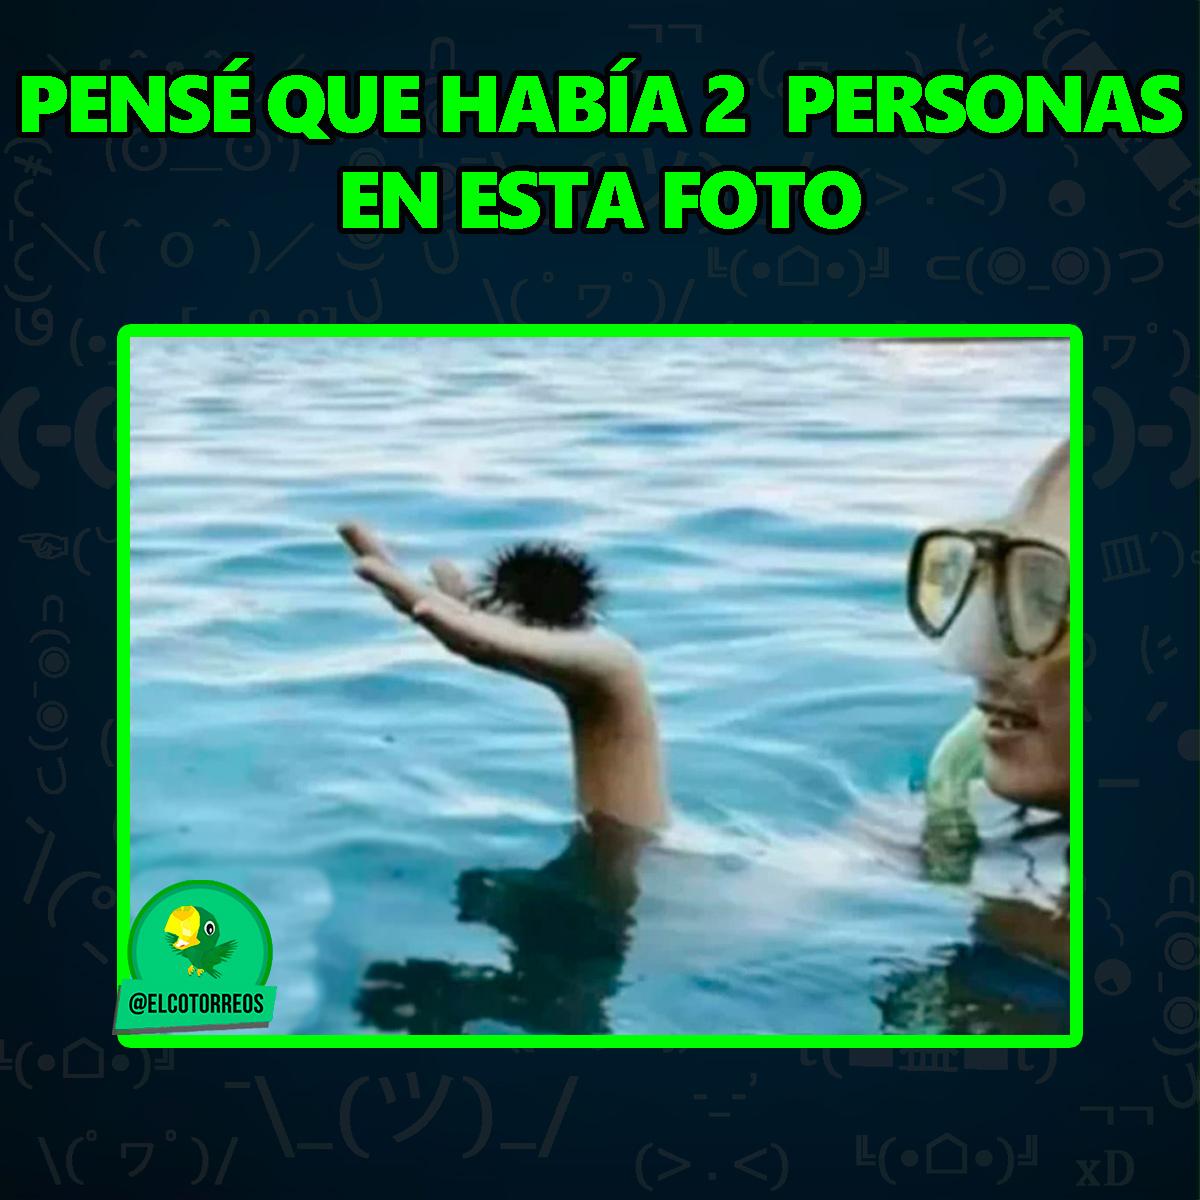 Mi propia mente me engaña.  Sígueme  para mucho mas: @elcotorreos  #memesespañol #momazos #momazo #memazos #momo #momos #memes #meme #humor #sdlg #momossad #momos_4k #repoio #cmamo #cmamut #chistes #gracioso #funnymemes #memes#lmao #memesdailypic.twitter.com/CijMoFwkPU